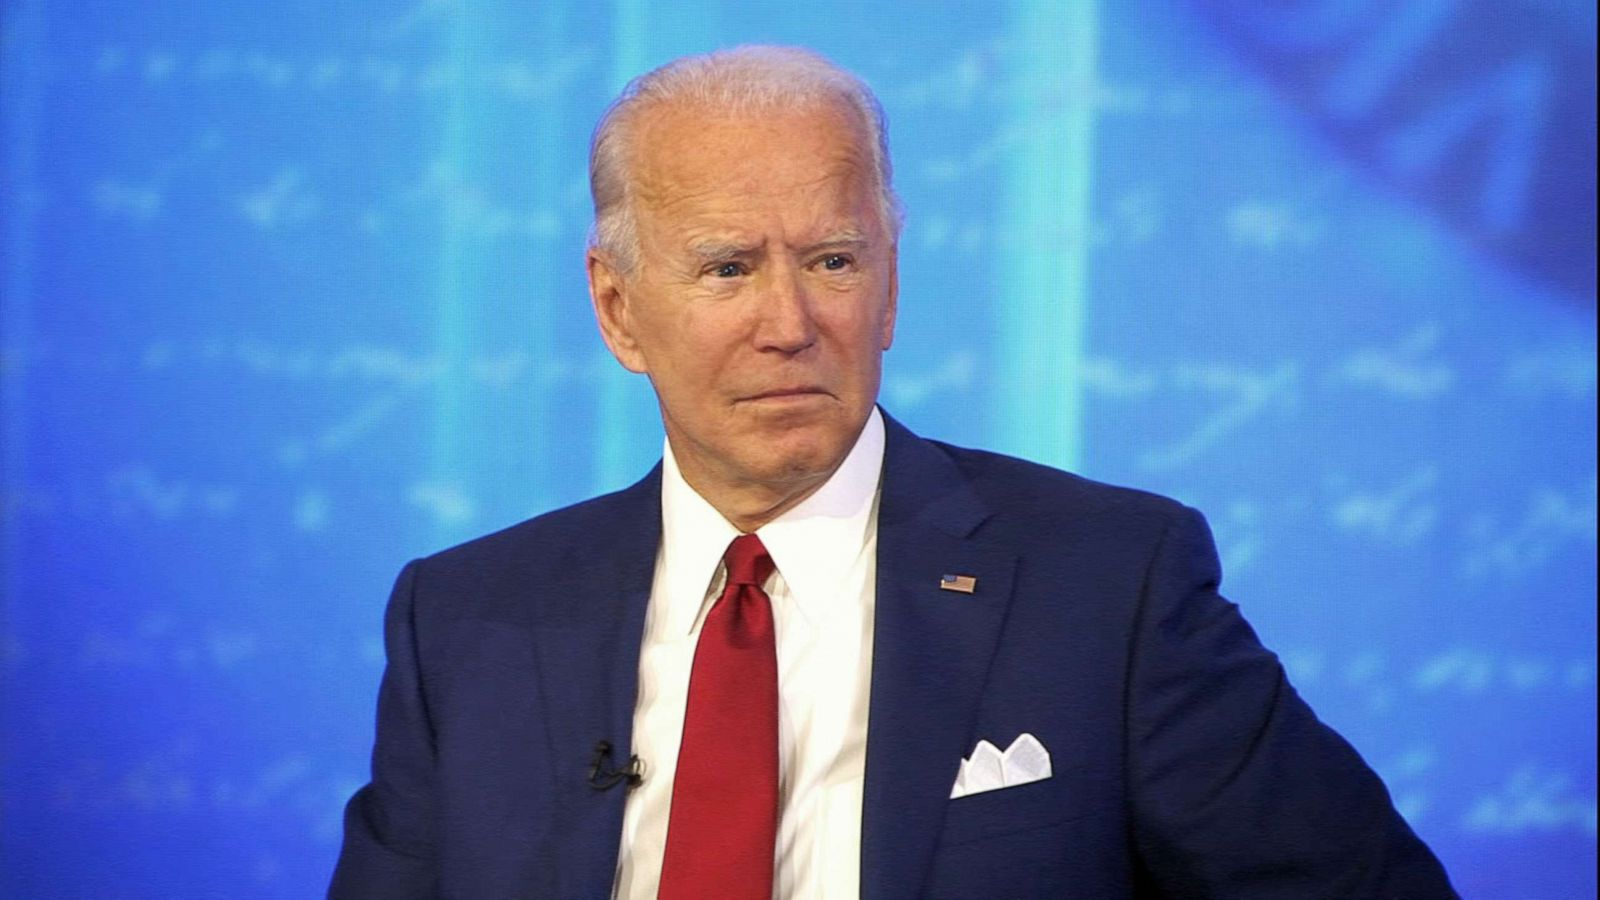 Read the full transcript of Joe Biden's ABC News town hall - ABC News